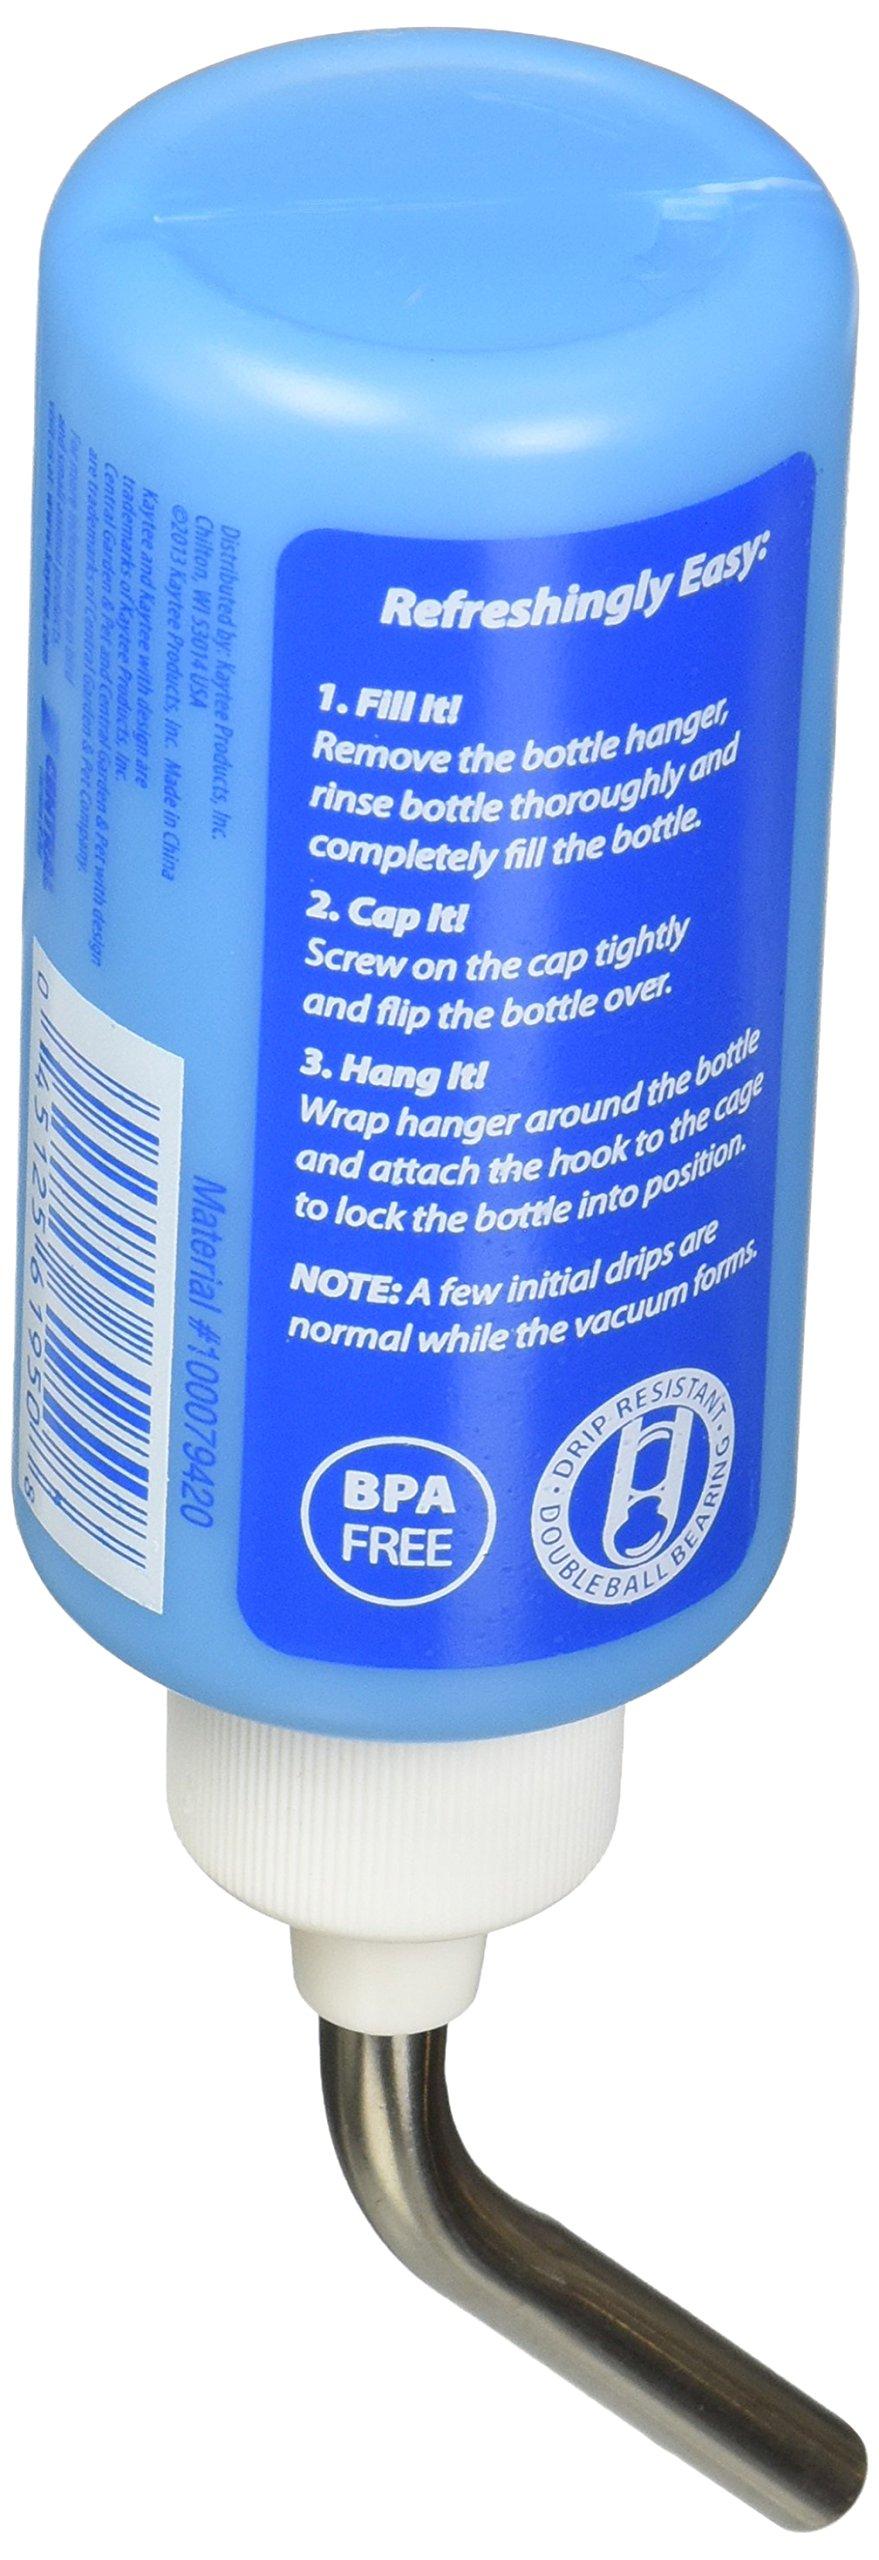 Superpet (Pets International) SSR100079420 12-Pack Critter Canteen Water Bottle Display, 4-Ounce by Kaytee